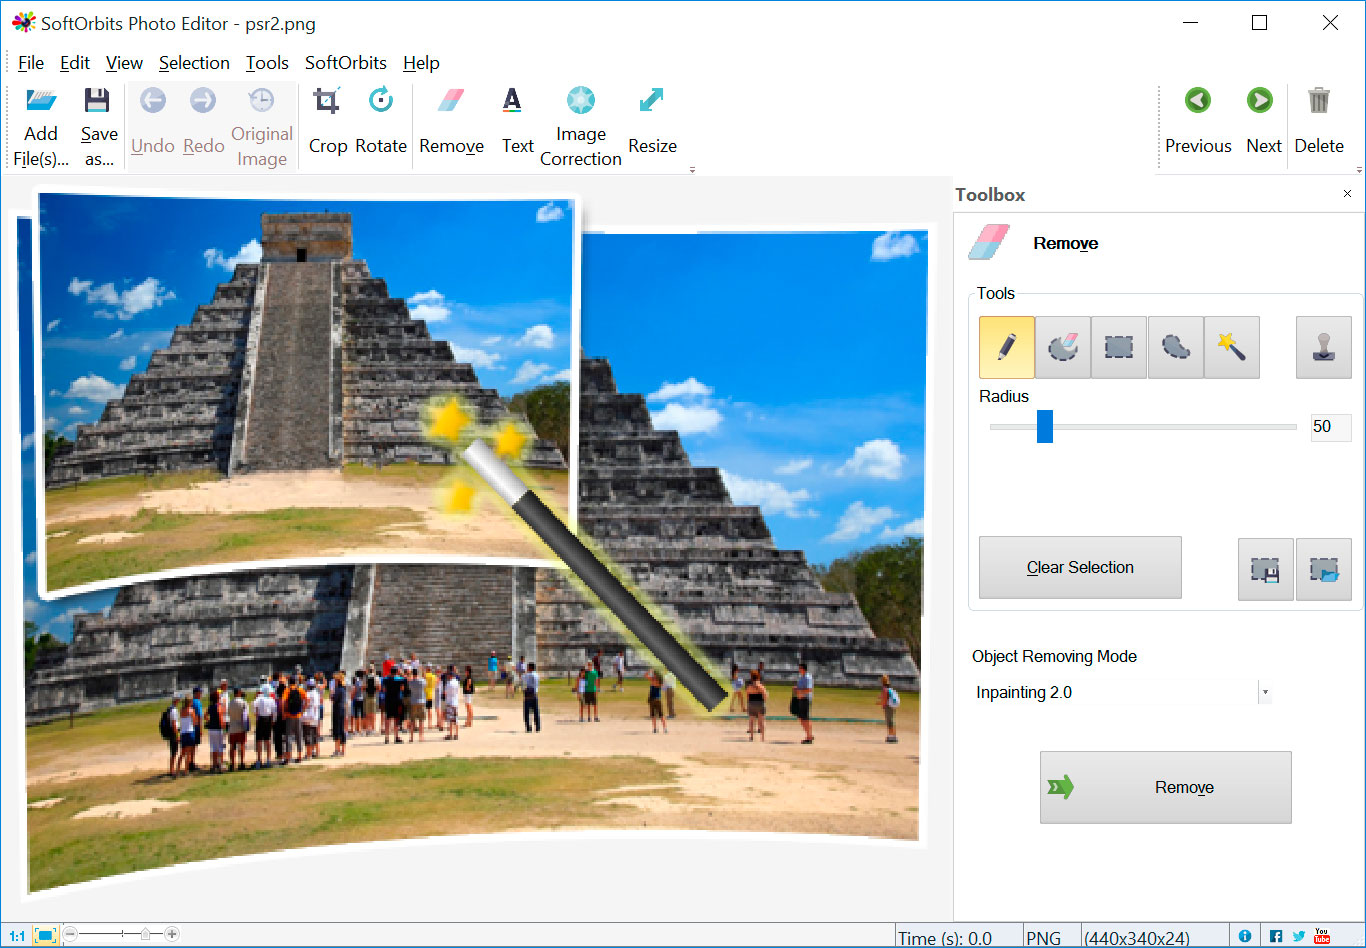 SoftOrbits Photo Editor صور من البرنامج